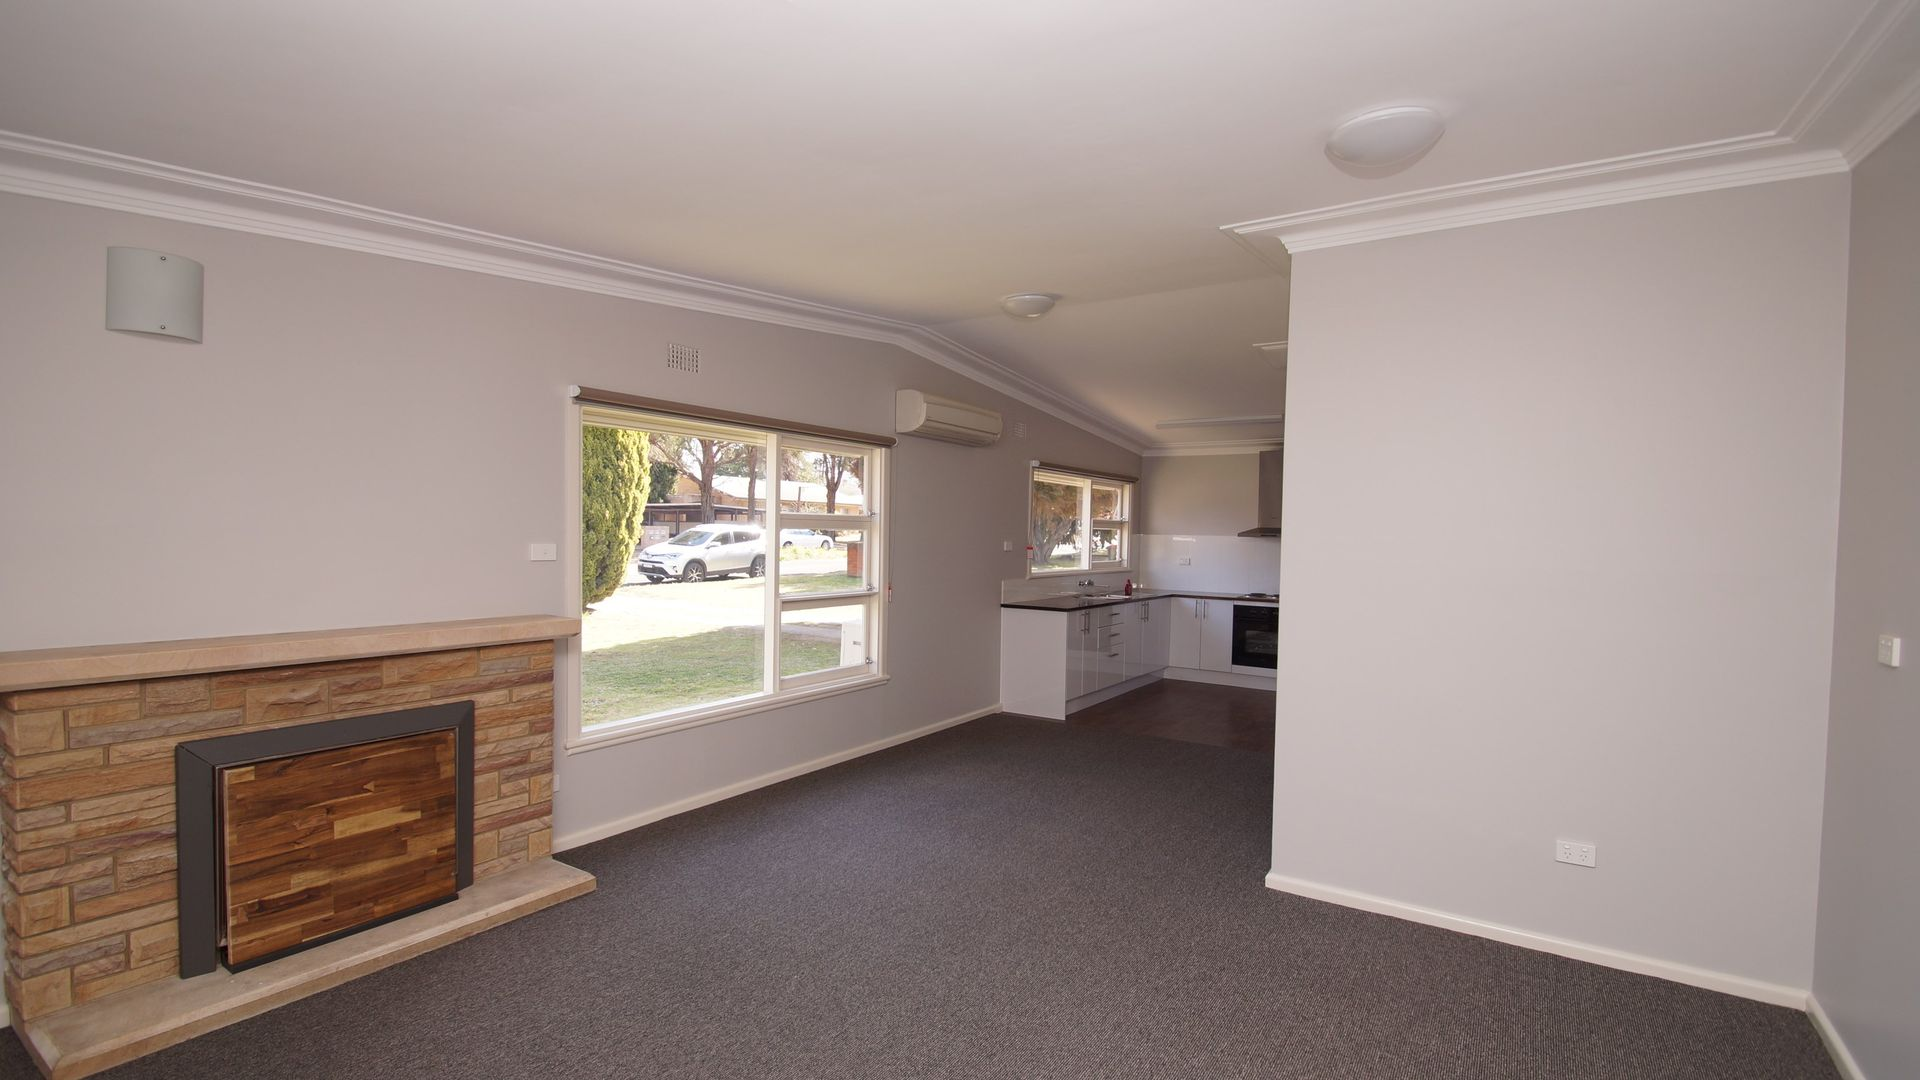 7 Bellevue Road, Armidale NSW 2350, Image 1